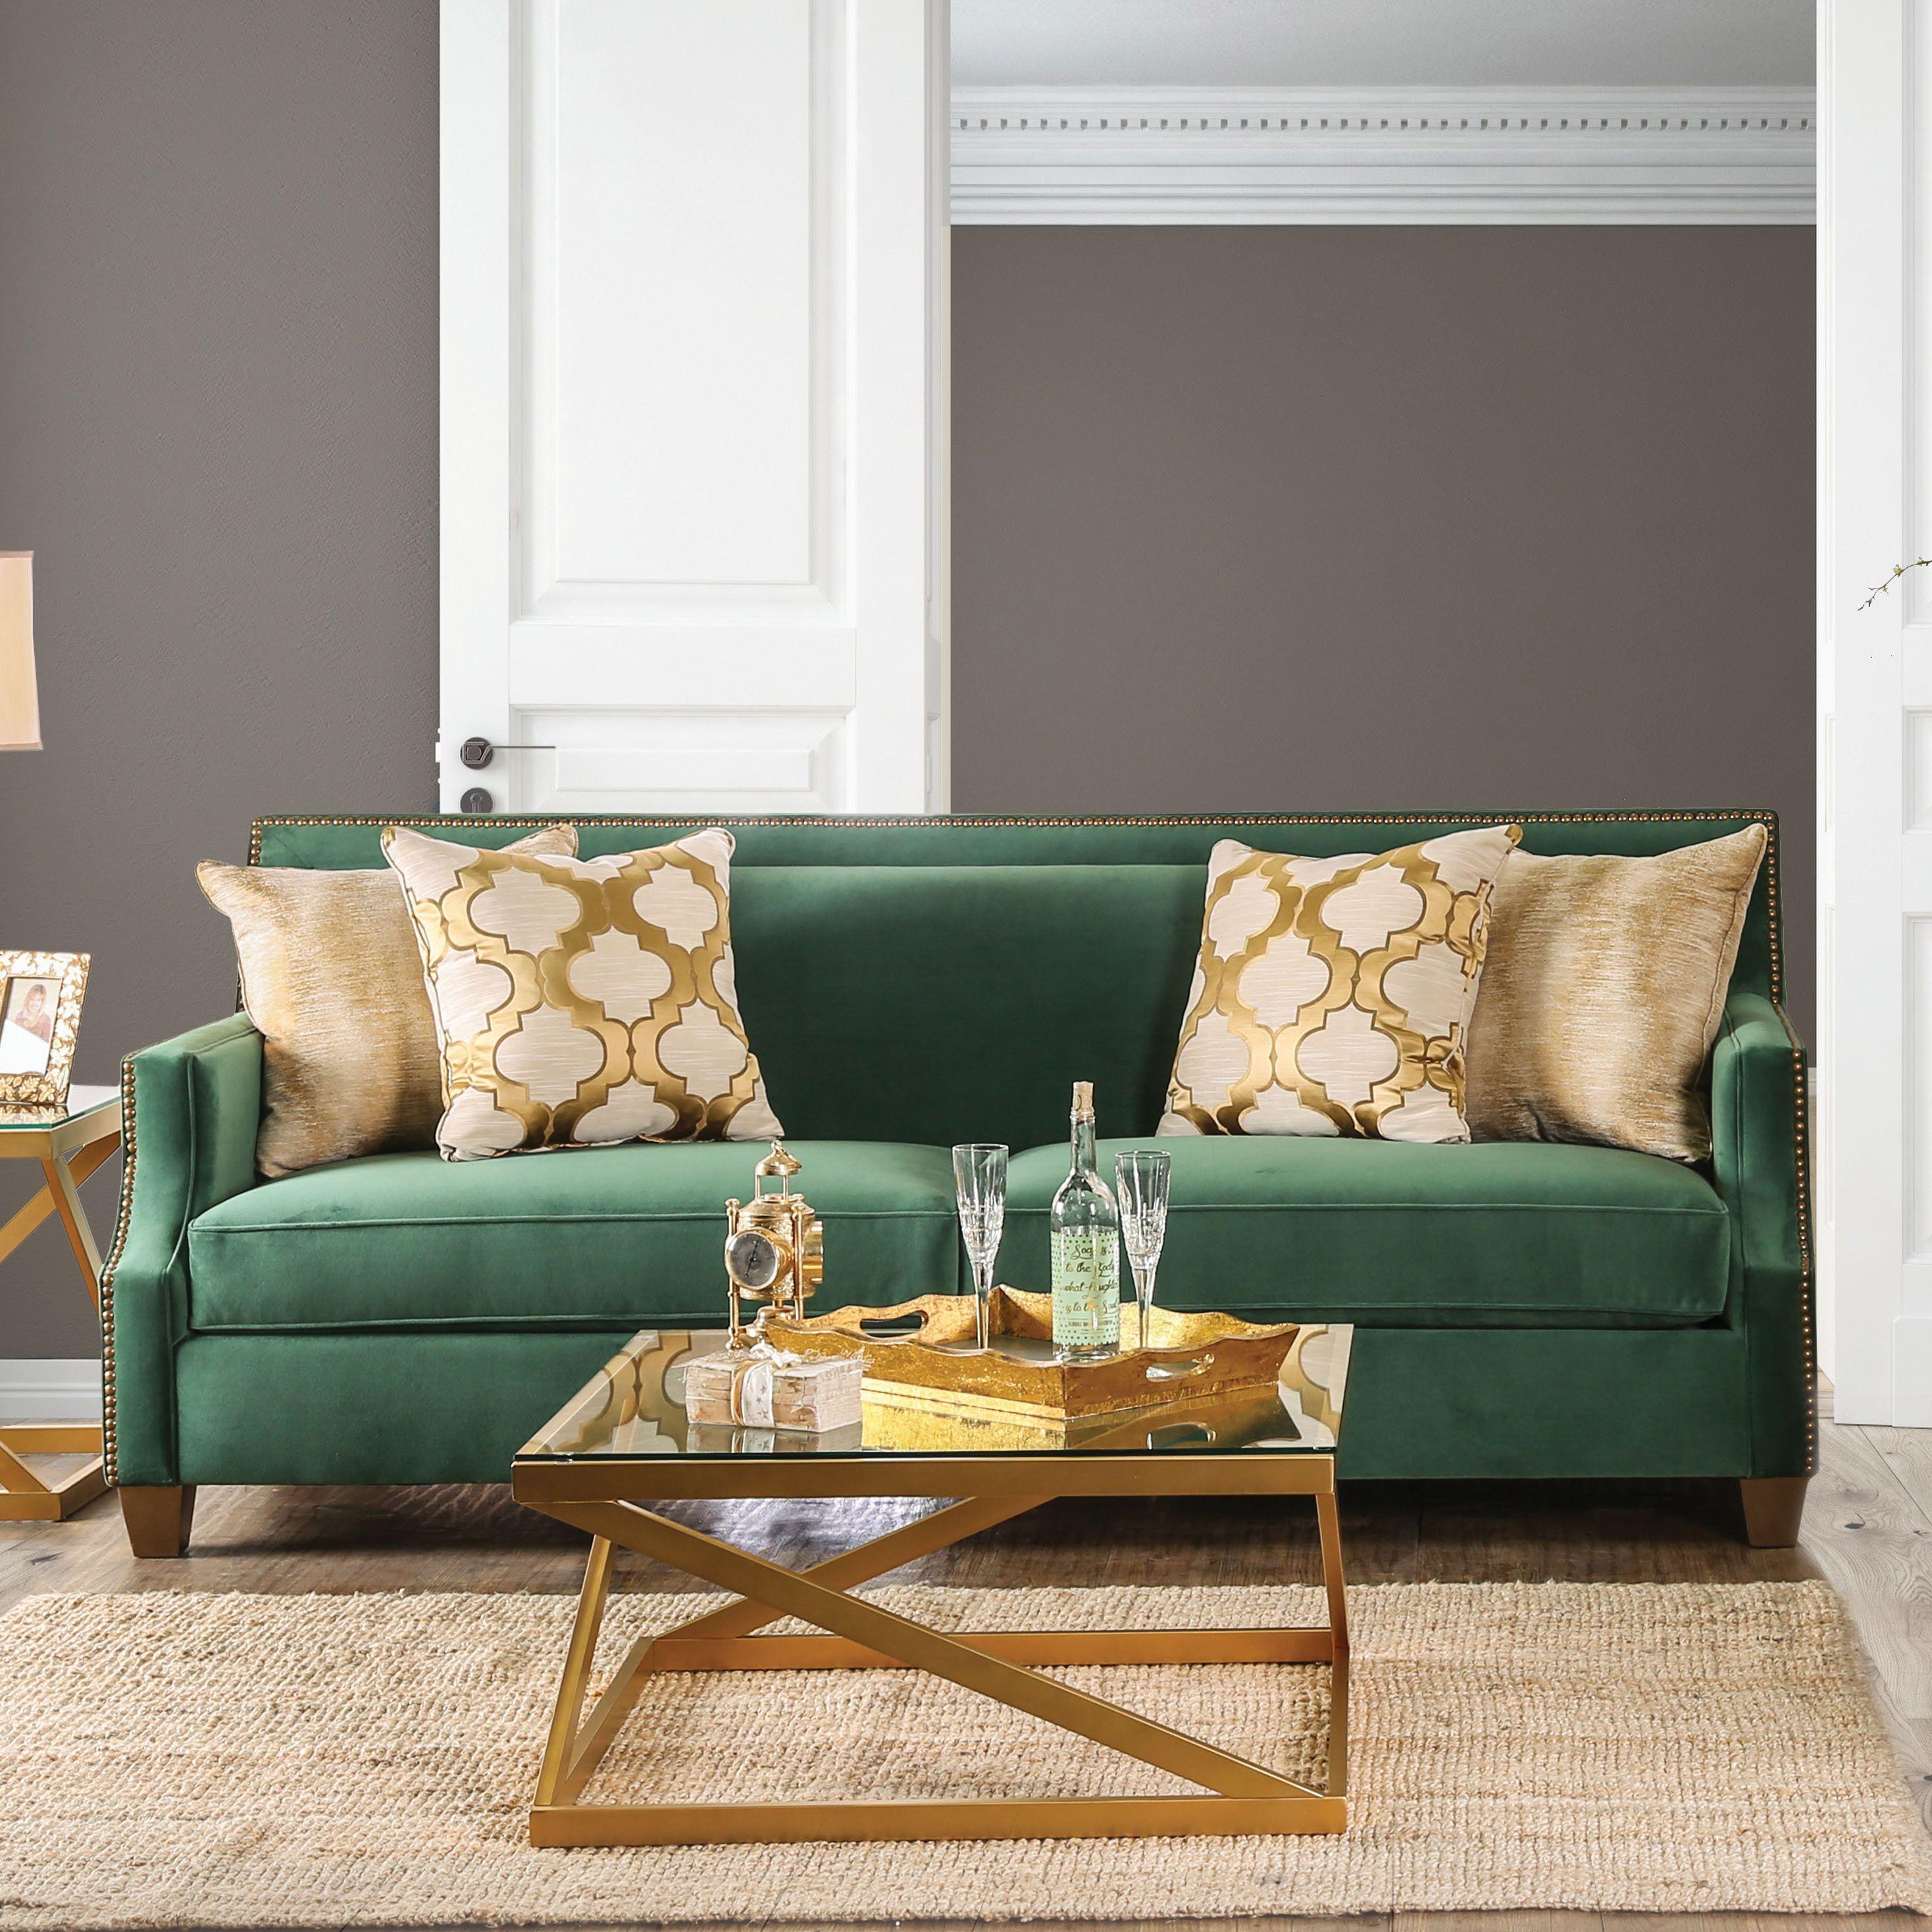 Katrina Contemporary Emerald Green Nailhead Sofa by FOA (Emerald Green), Furniture of America images